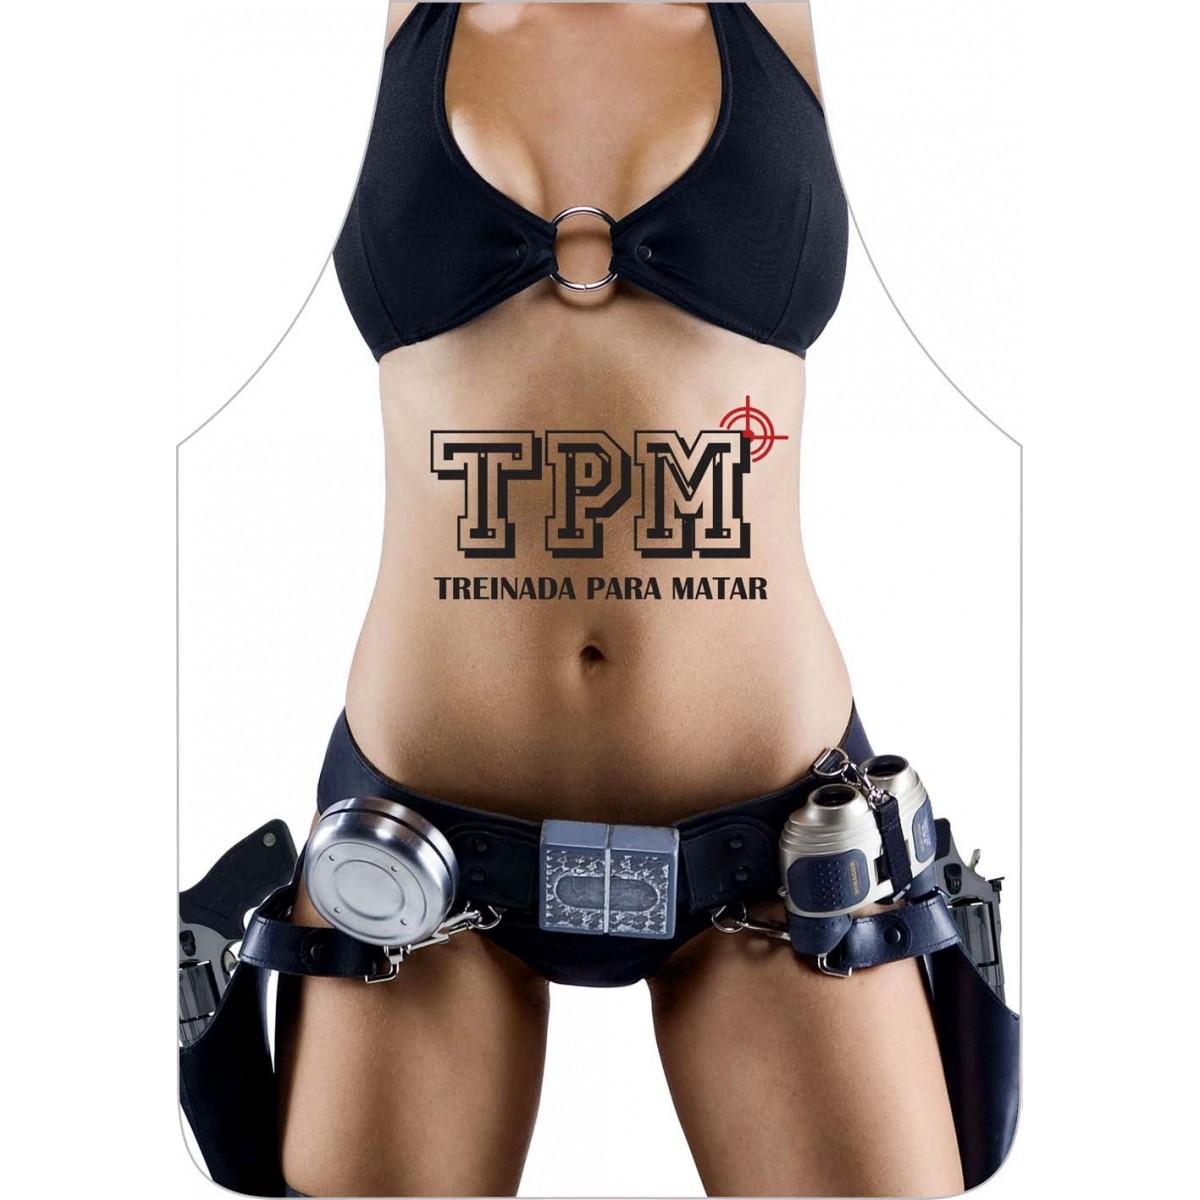 Avental Divertido E Personalizado: Tpm  - RECANTO DA COSTURA